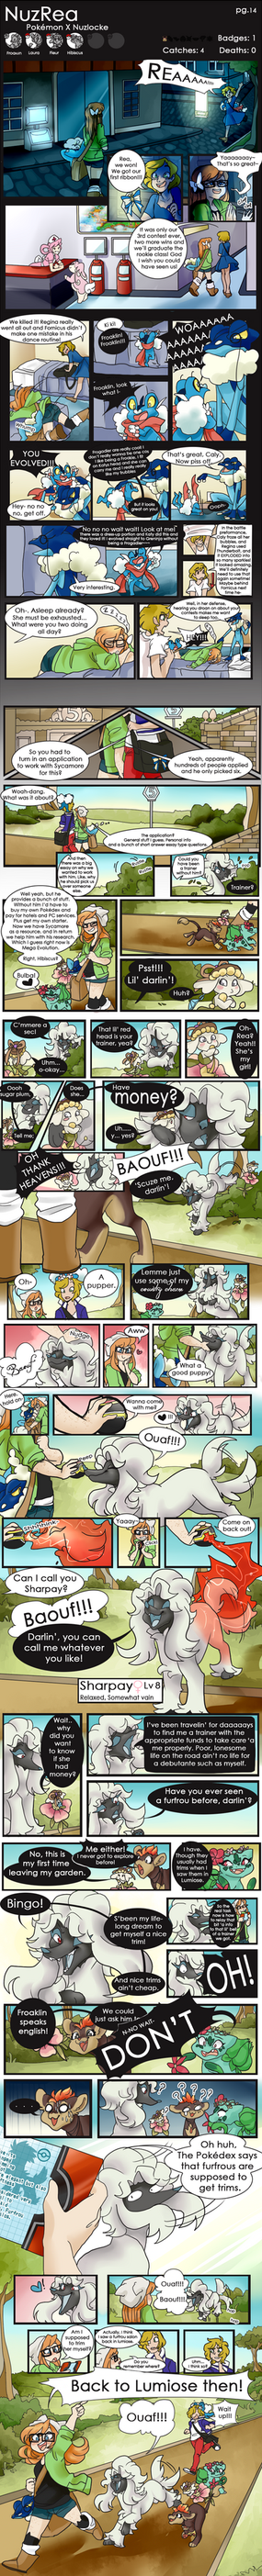 NuzRea: Page 14 by Skitea